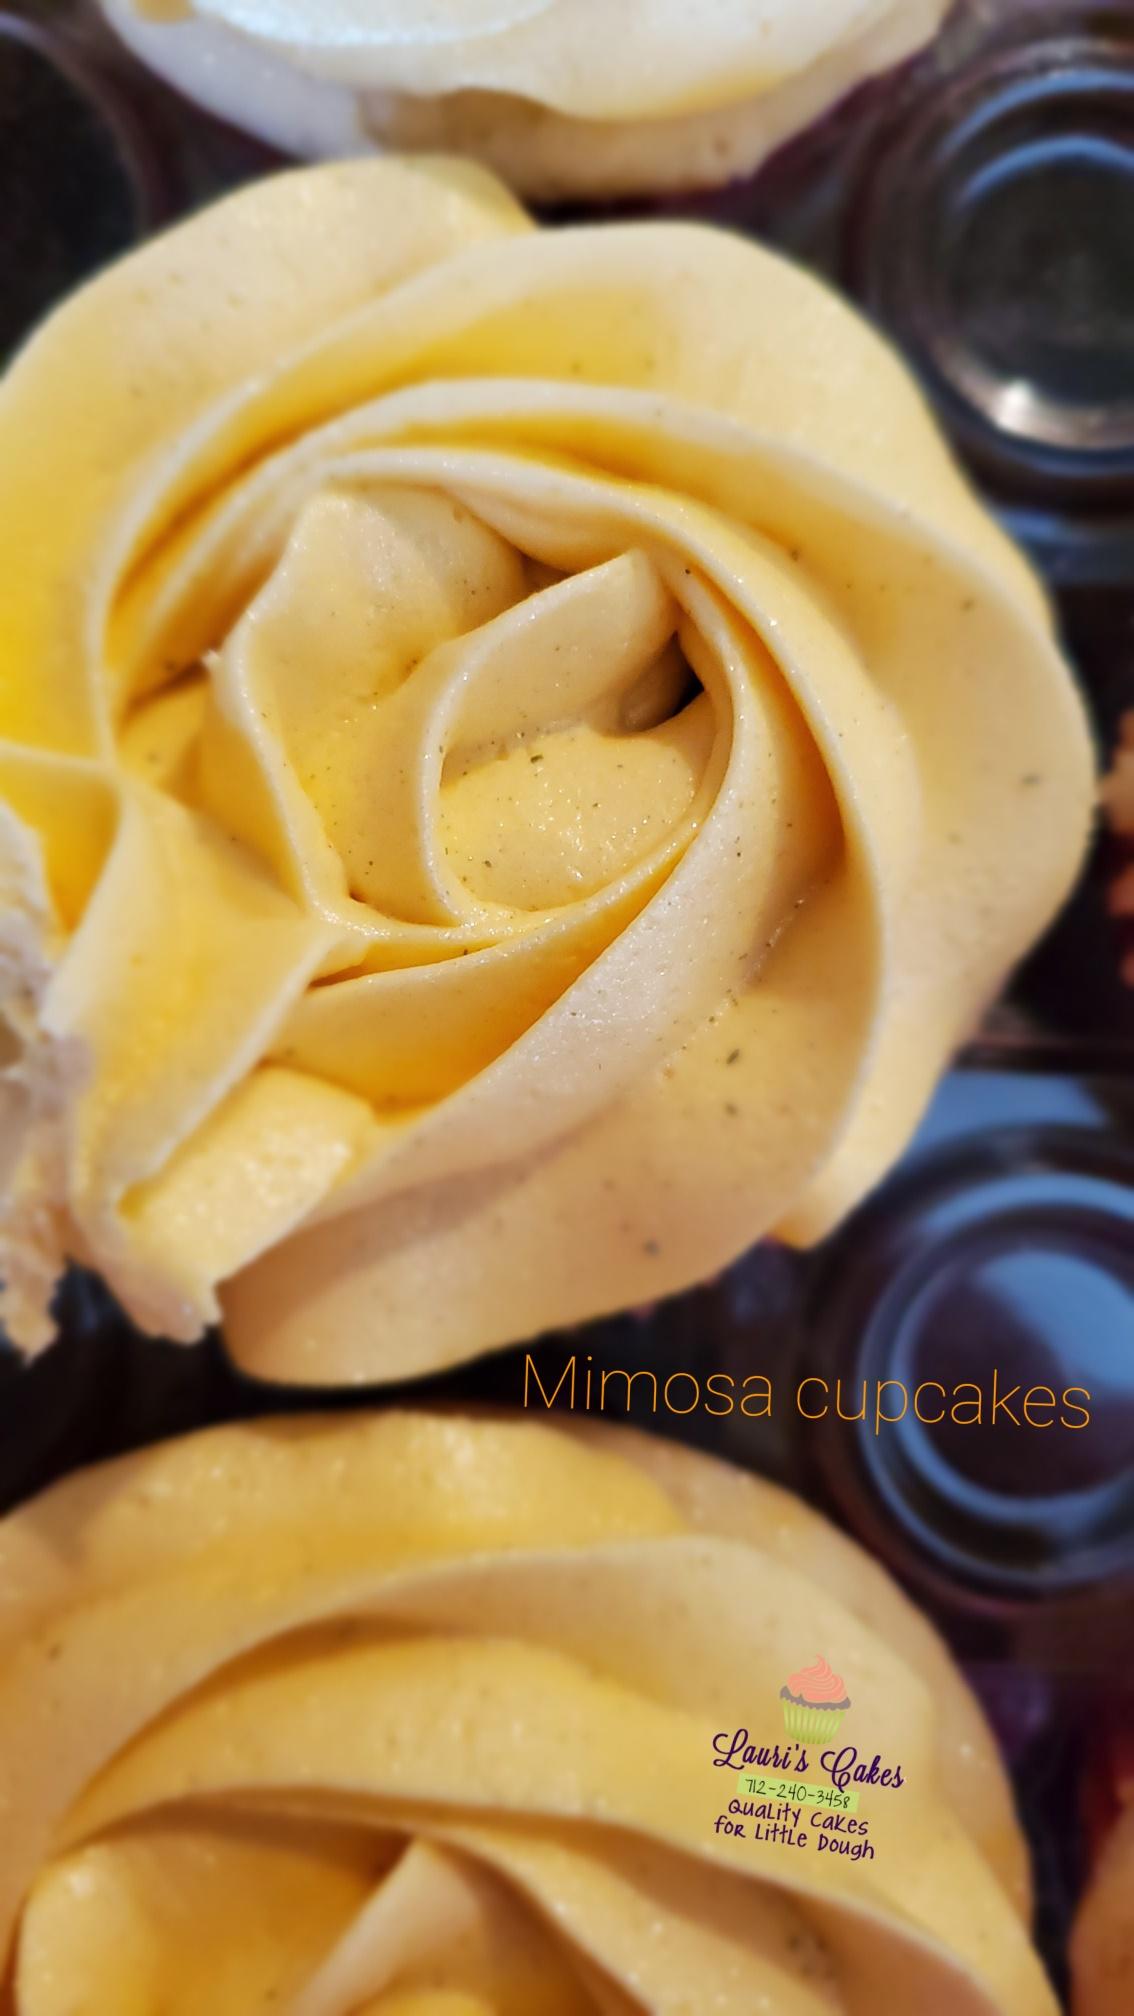 Mimosa-cupcakes-June-4-2021